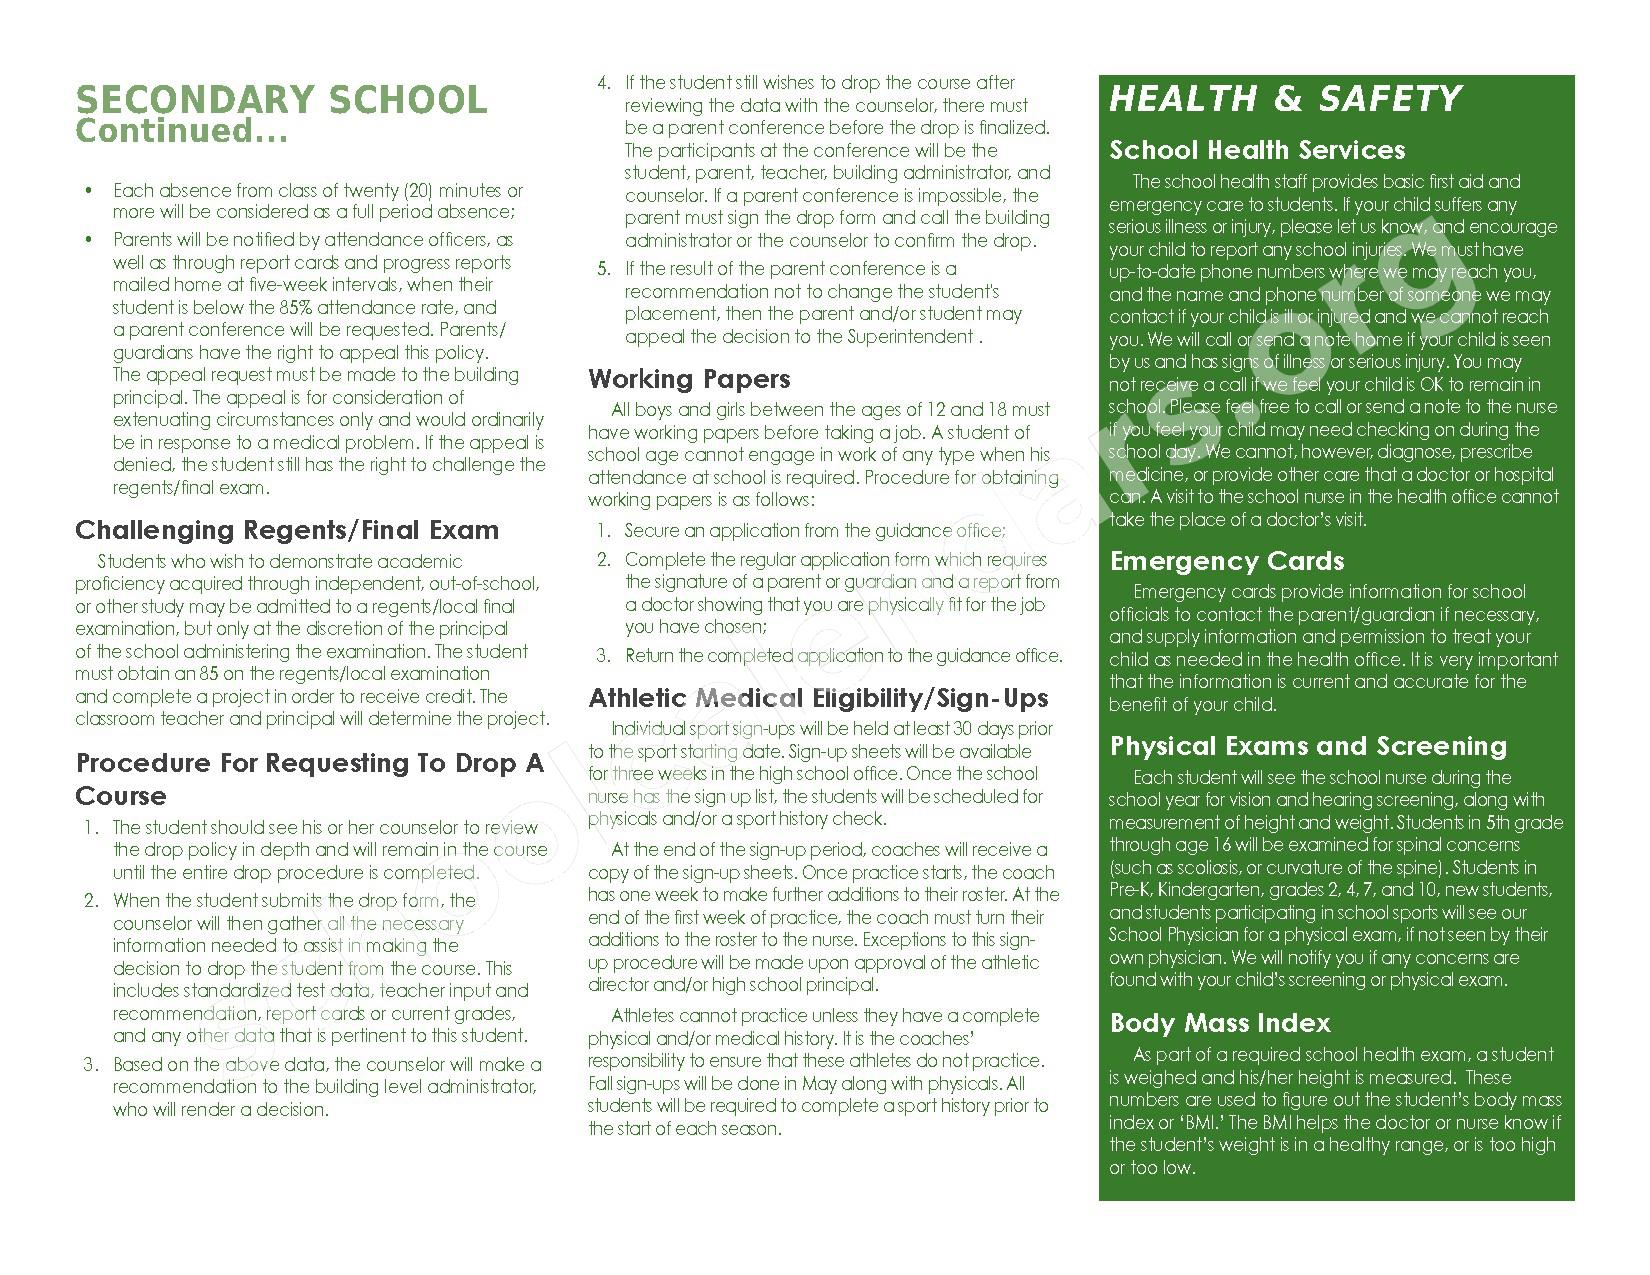 2016 - 2017 School Calendar – Salmon River Central School District – page 35